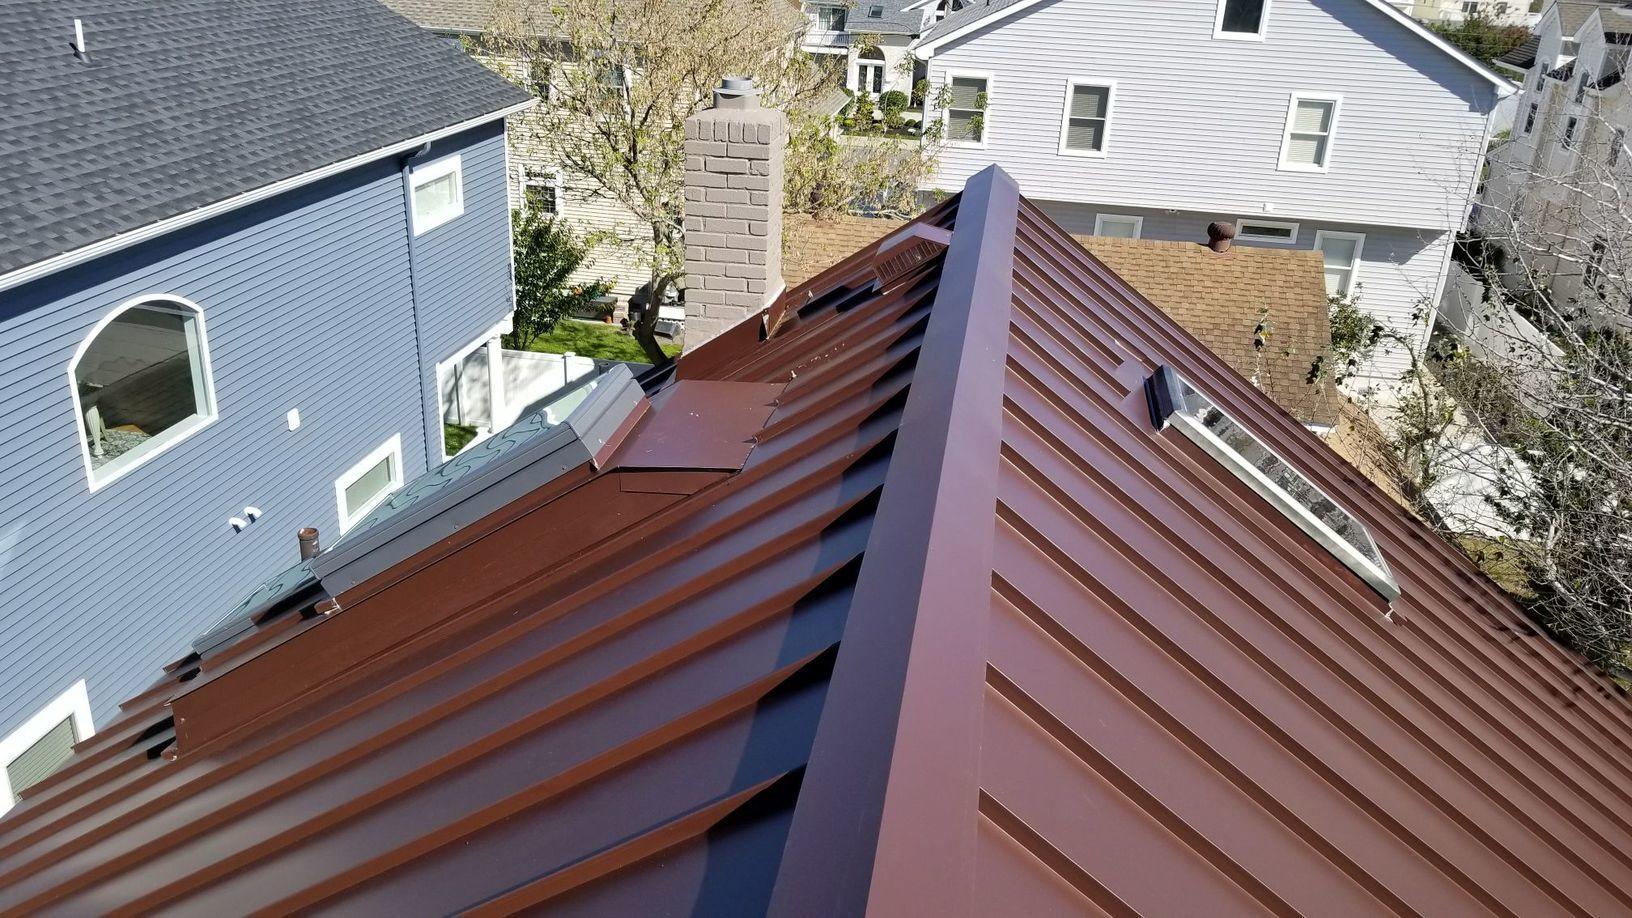 Mansard Brown Standing Seam Metal Roof Install in Brigantine, NJ